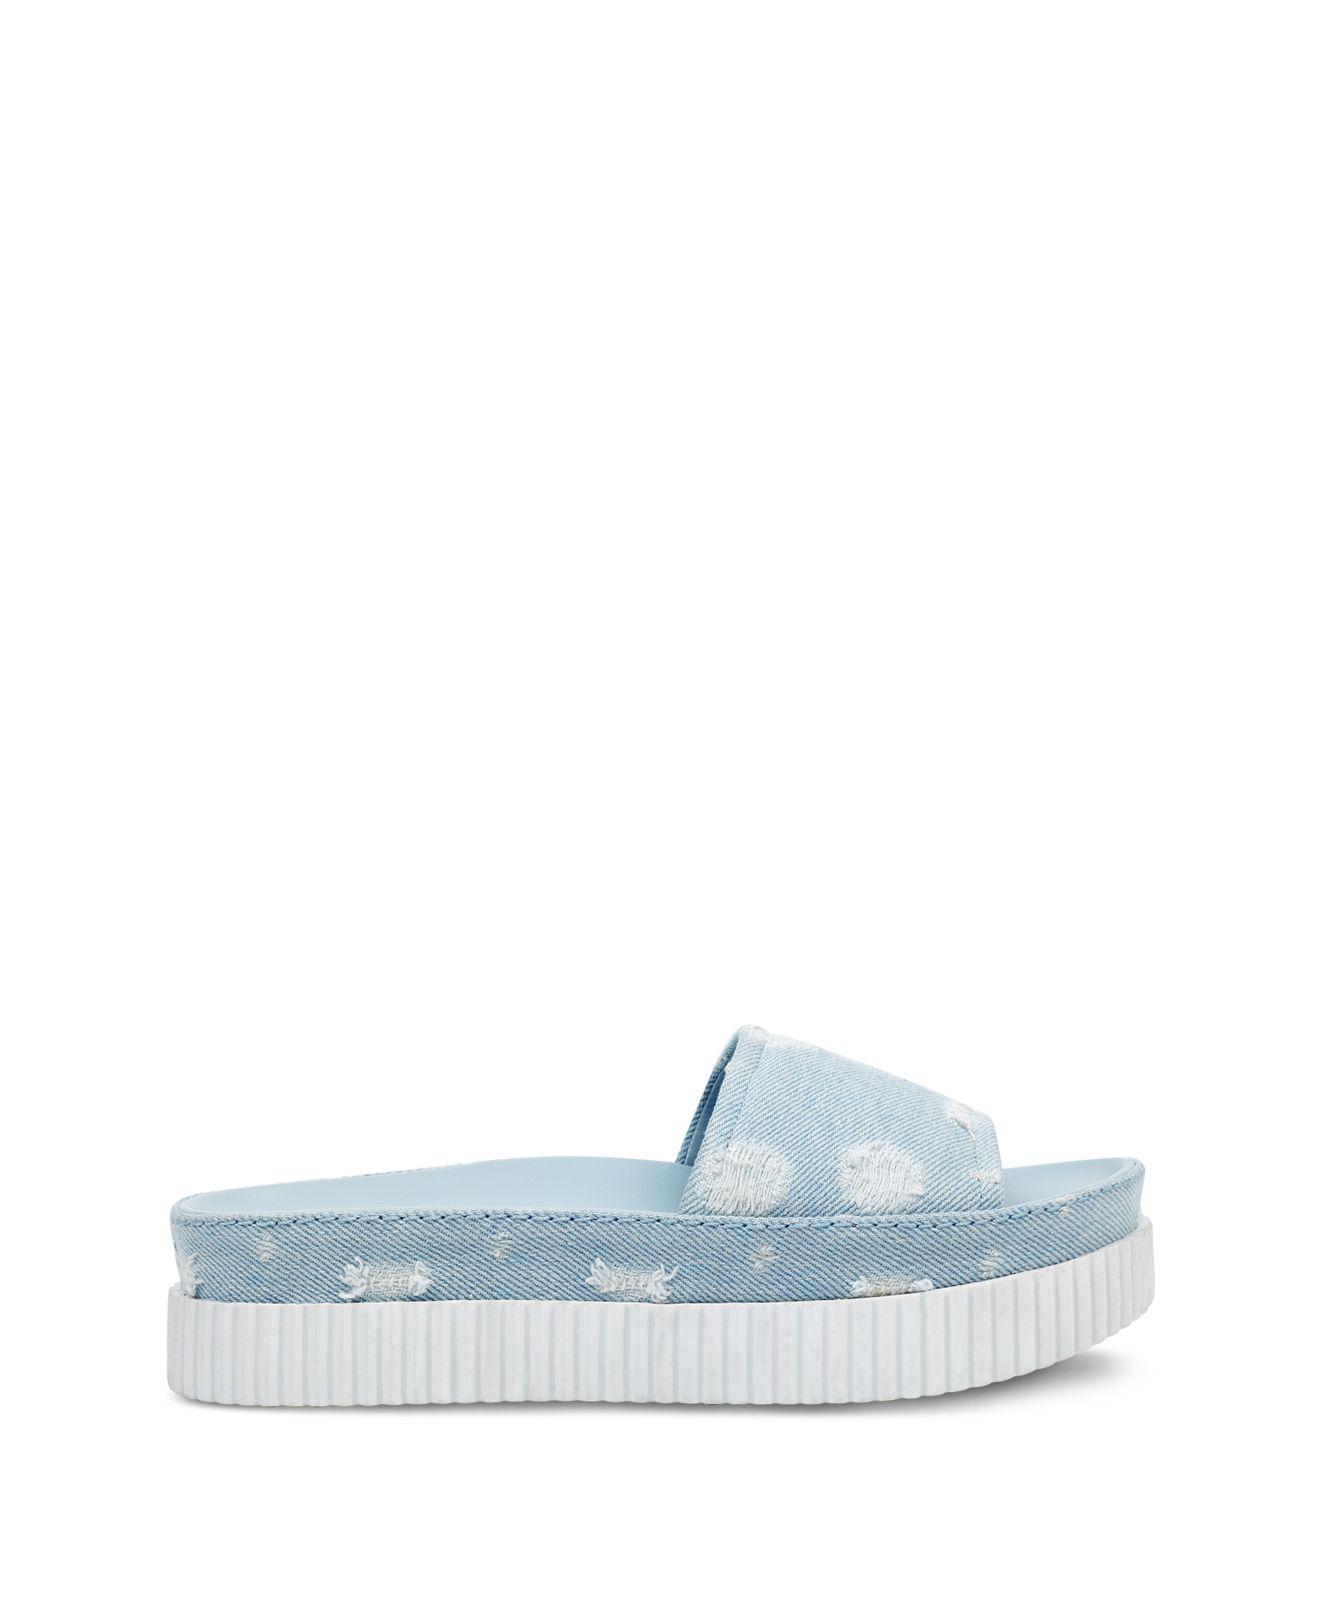 Kendall And Kylie Isla Dot-Distressed Denim Slide Sandals - 100% Exclusive kfYZ9o